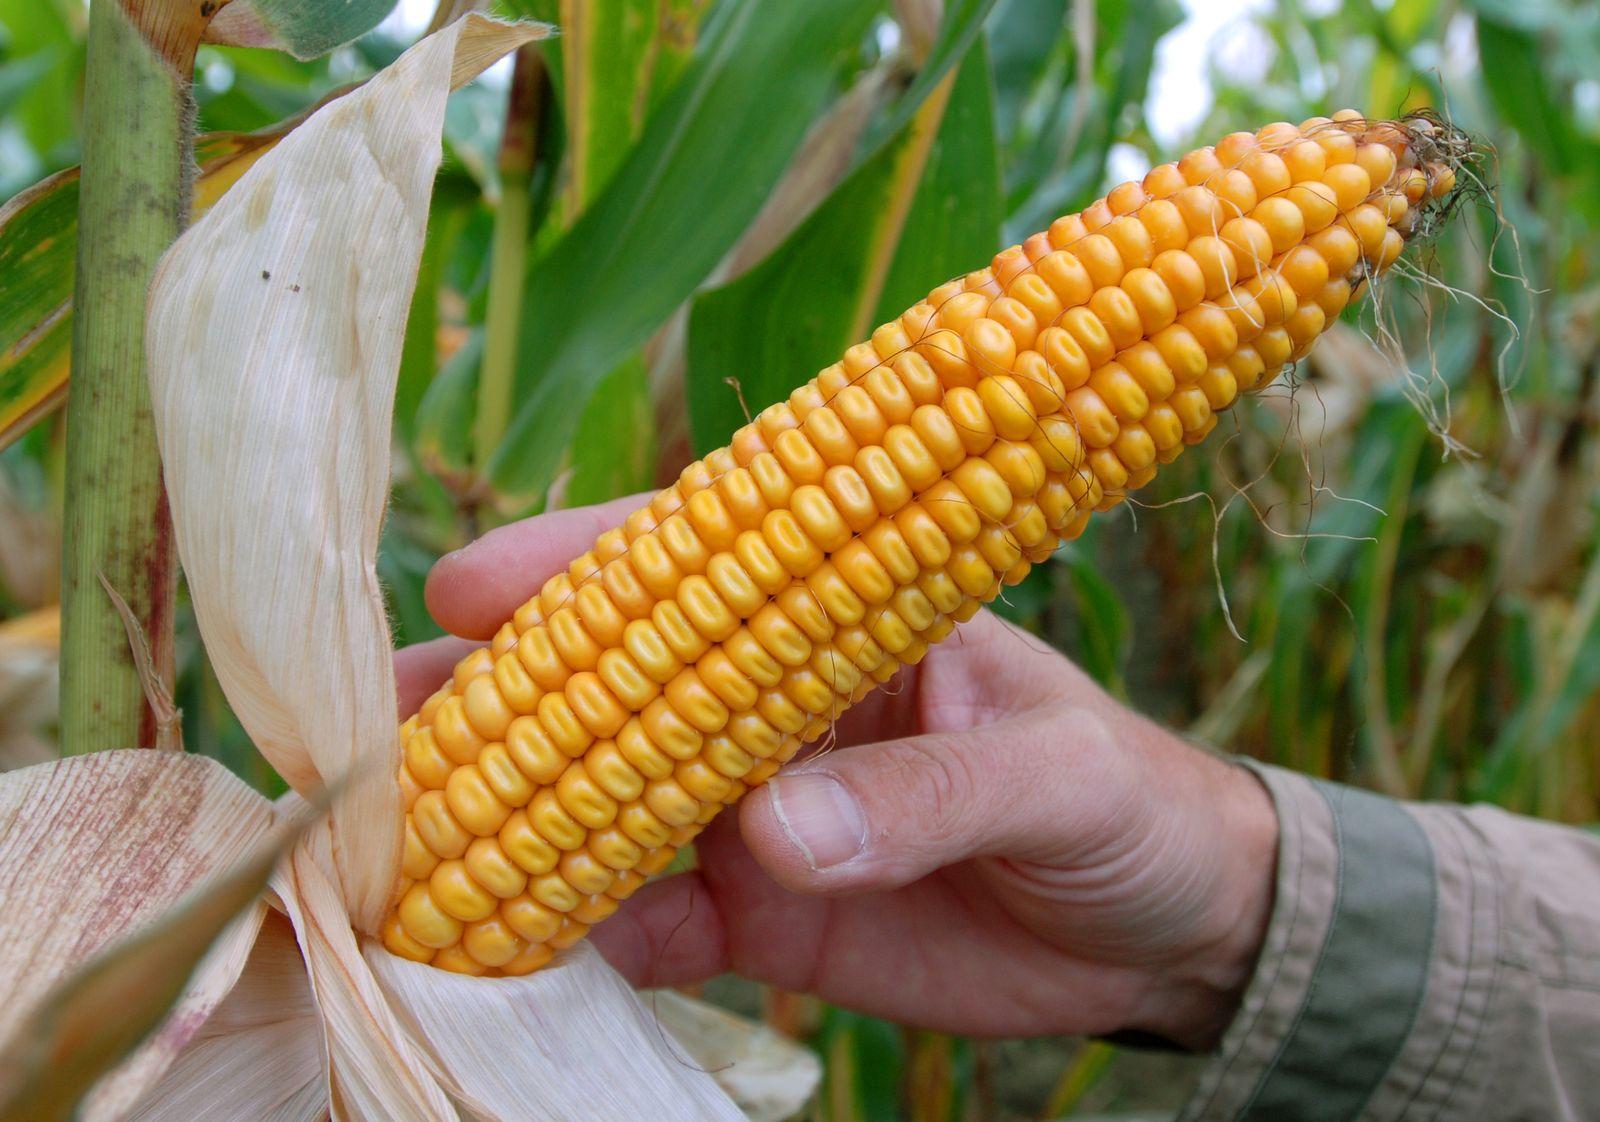 Genmais / Monsanto